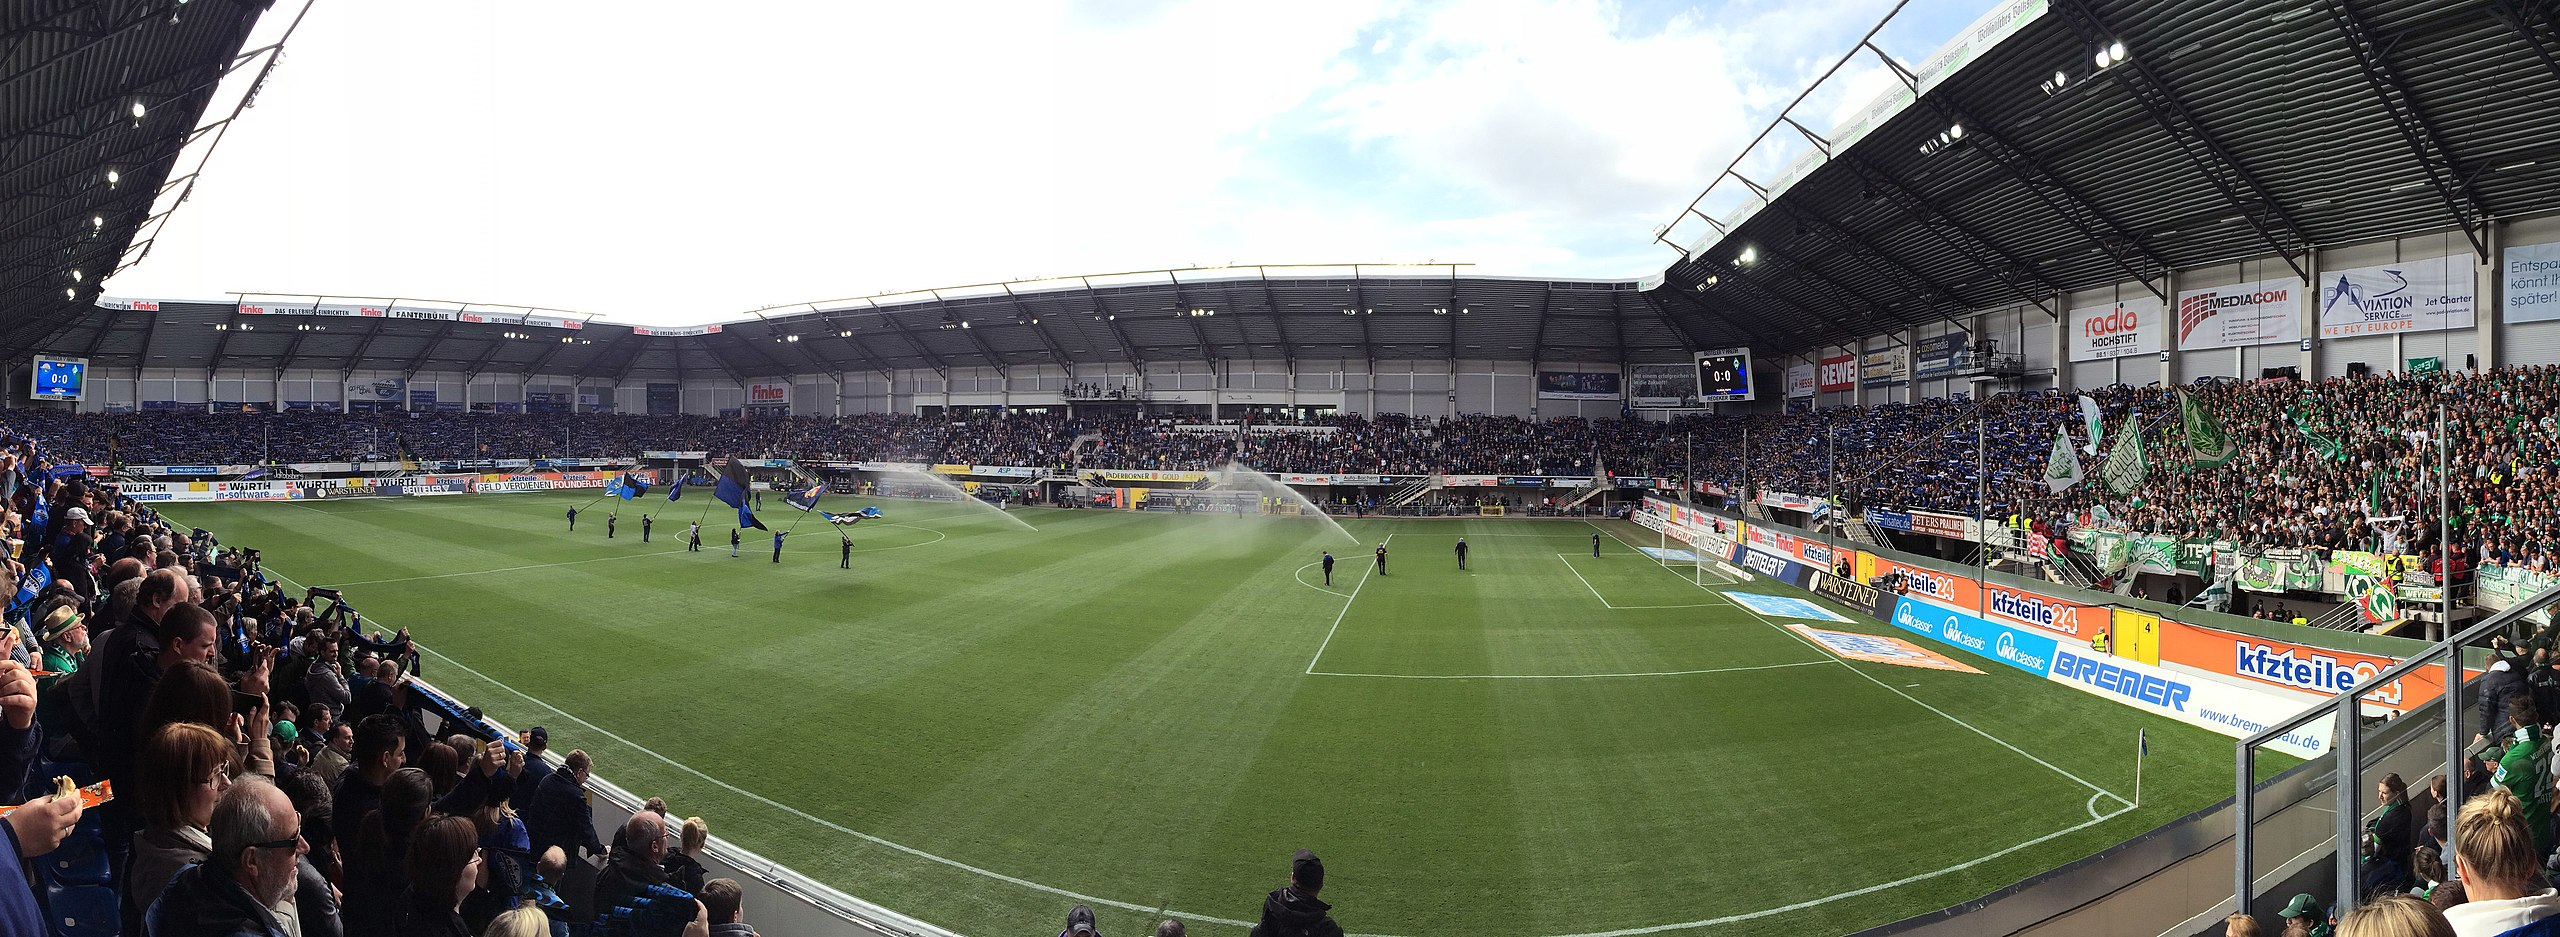 Der SC Paderborn im Blickpunkt